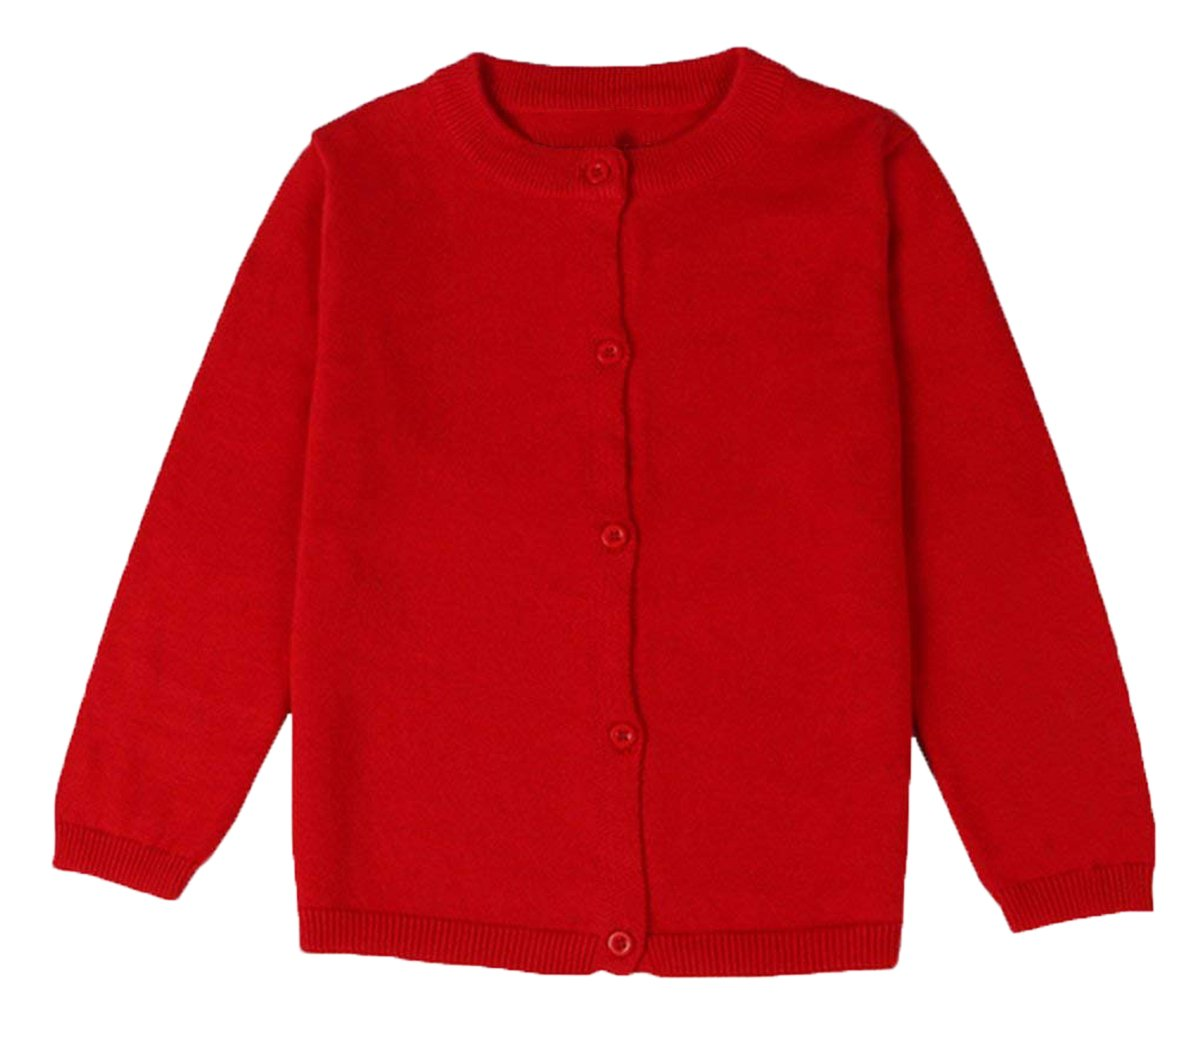 lymanchi Little Girls' Long Sleeve Cardigan Button Crewneck Knit Bowknot Sweater 101 Red 5